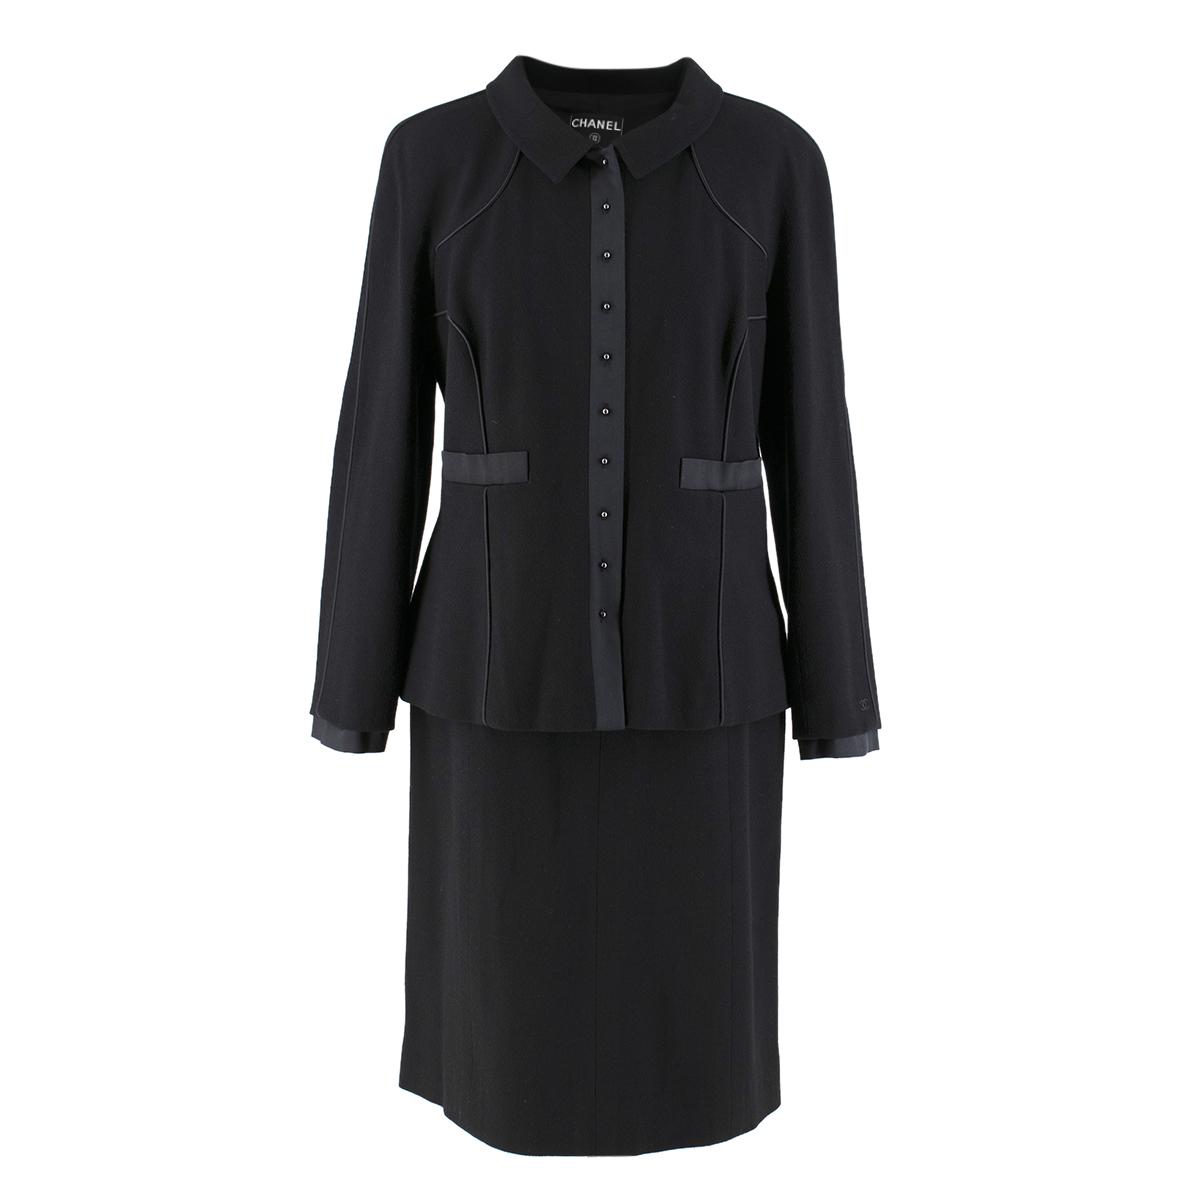 Chanel Vintage Black Wool Skirt and Jacket Set